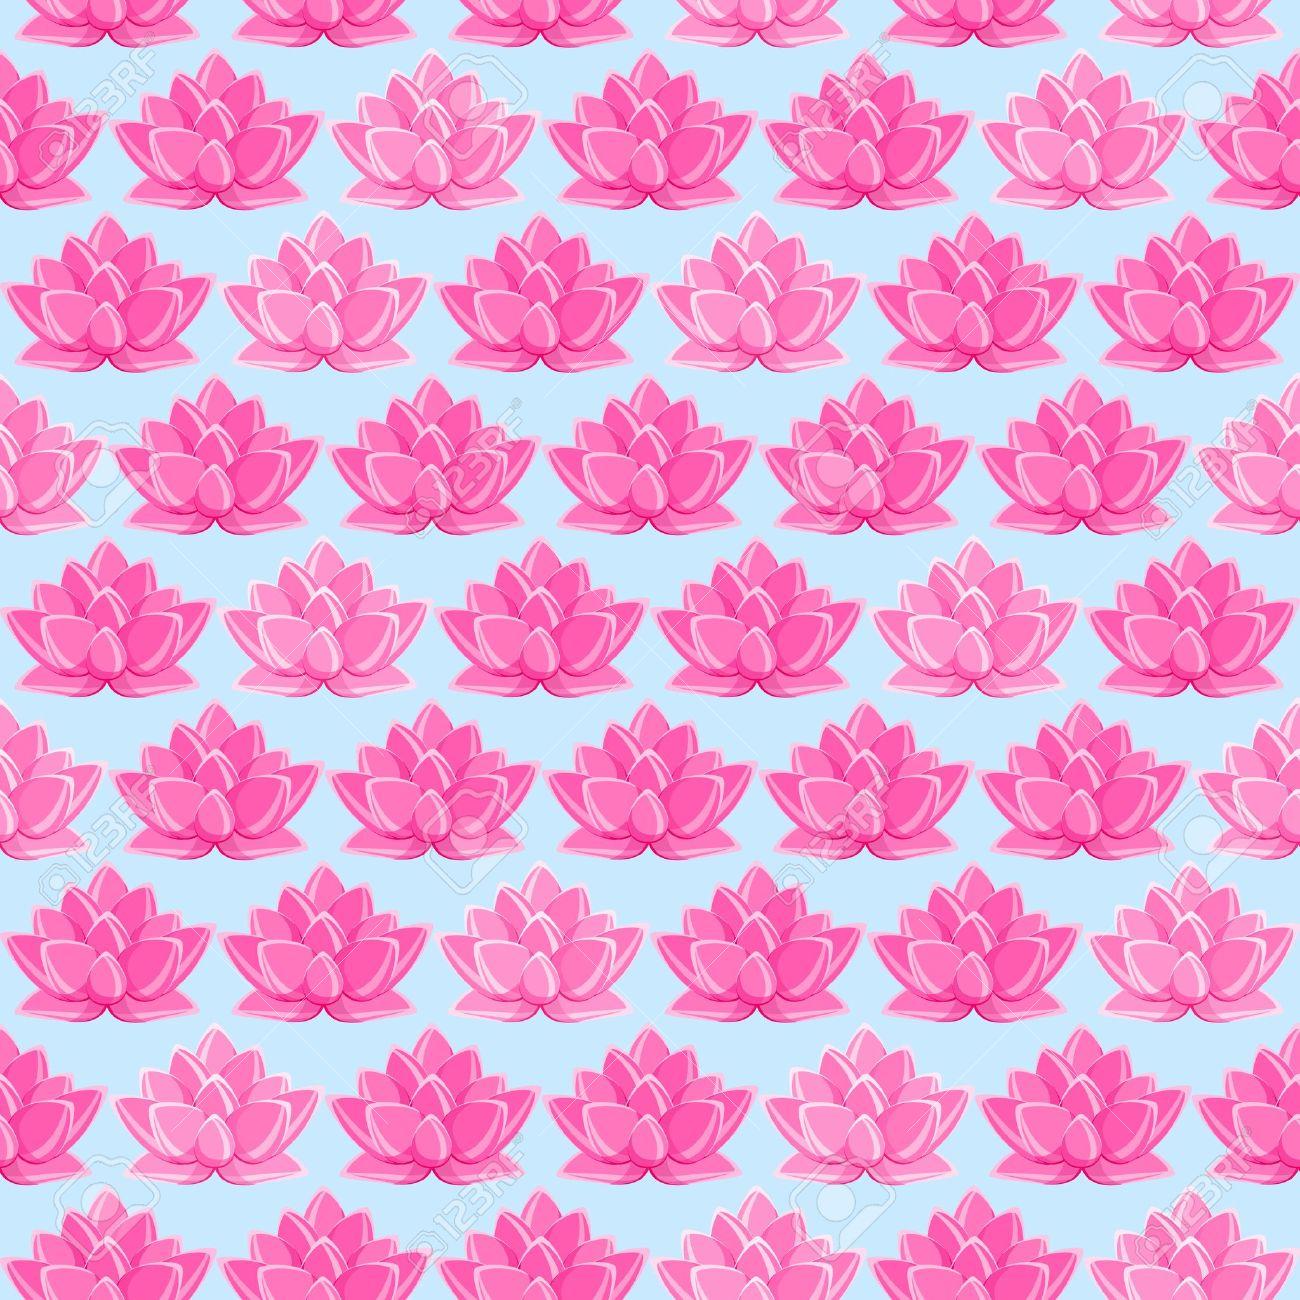 Yoga pattern background seamless pattern with five petals lotus flower - Purple Lotus Pink Lotus Flower Seamless Pattern Floral Texture On Light Blue Background Illustration